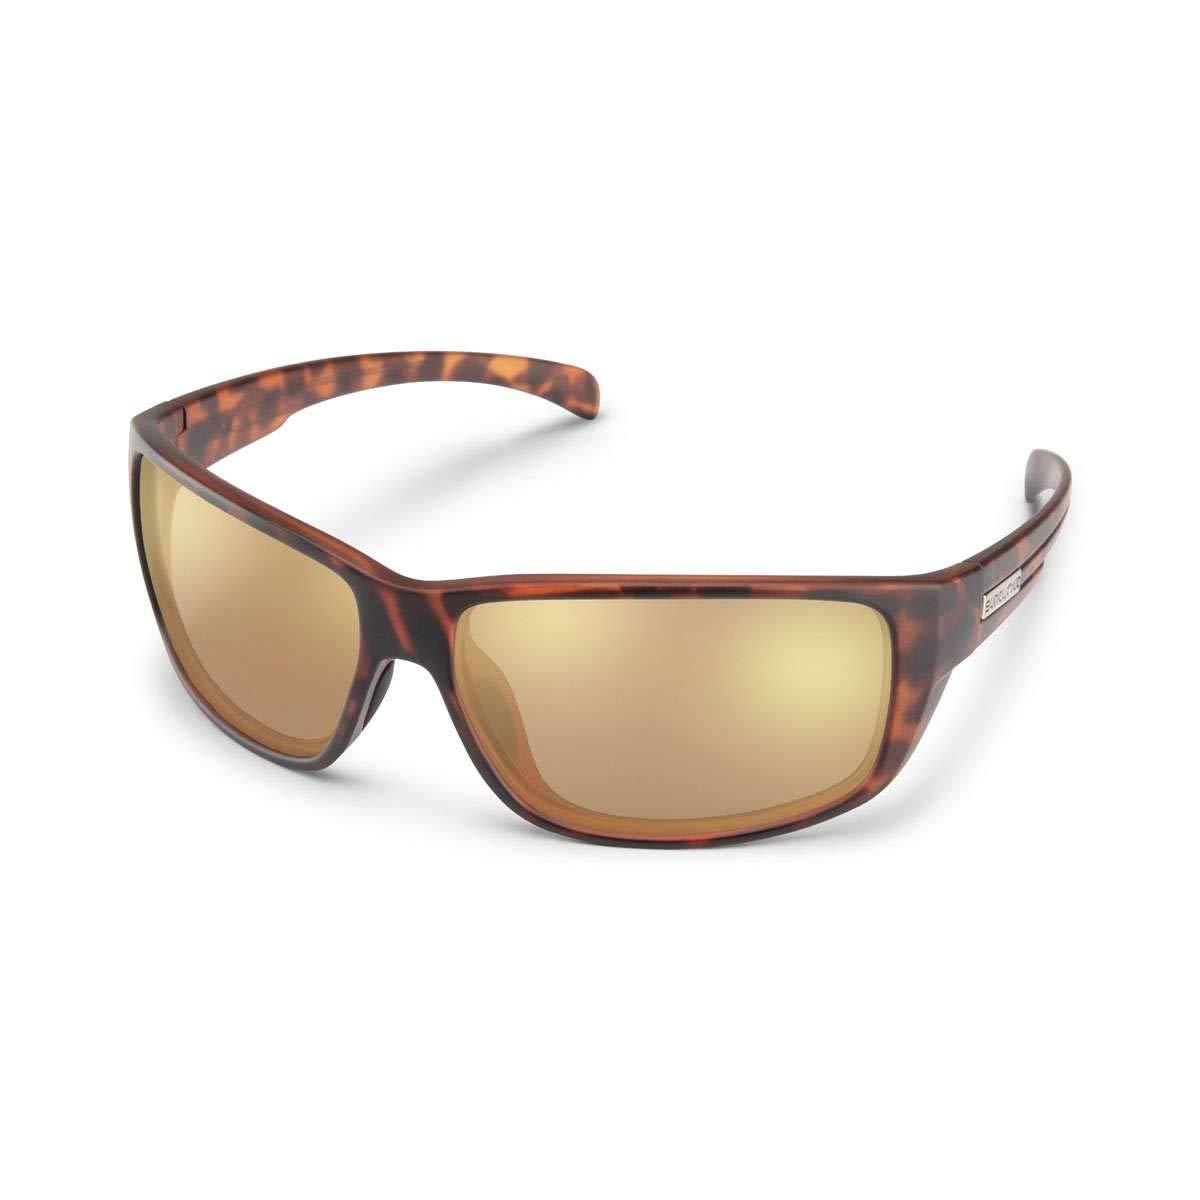 33109a4748e Amazon.com  Suncloud Optics Milestone Polarized Sunglasses (Mirror Green  Polarized